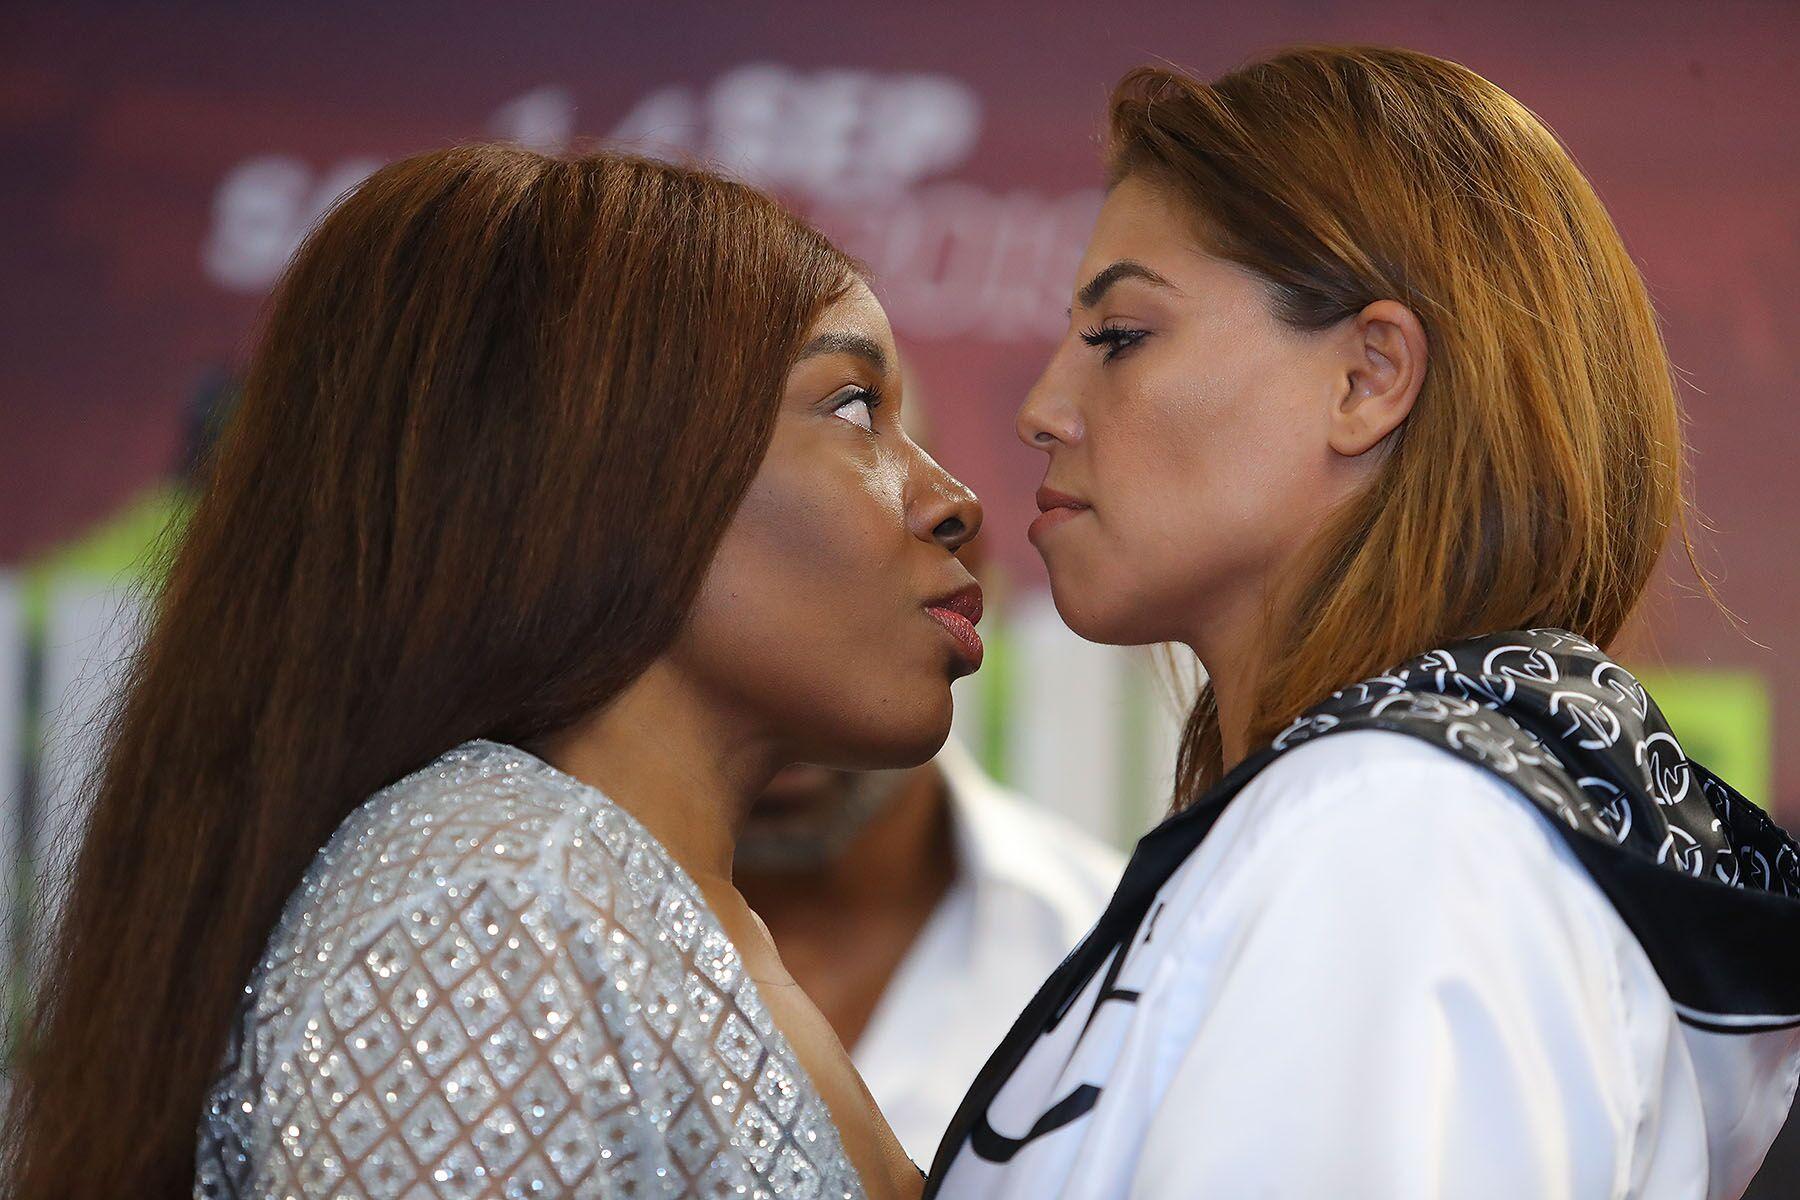 Franchon Crews Outpoints Maricela Cornejo In Rematch Retains Wbc